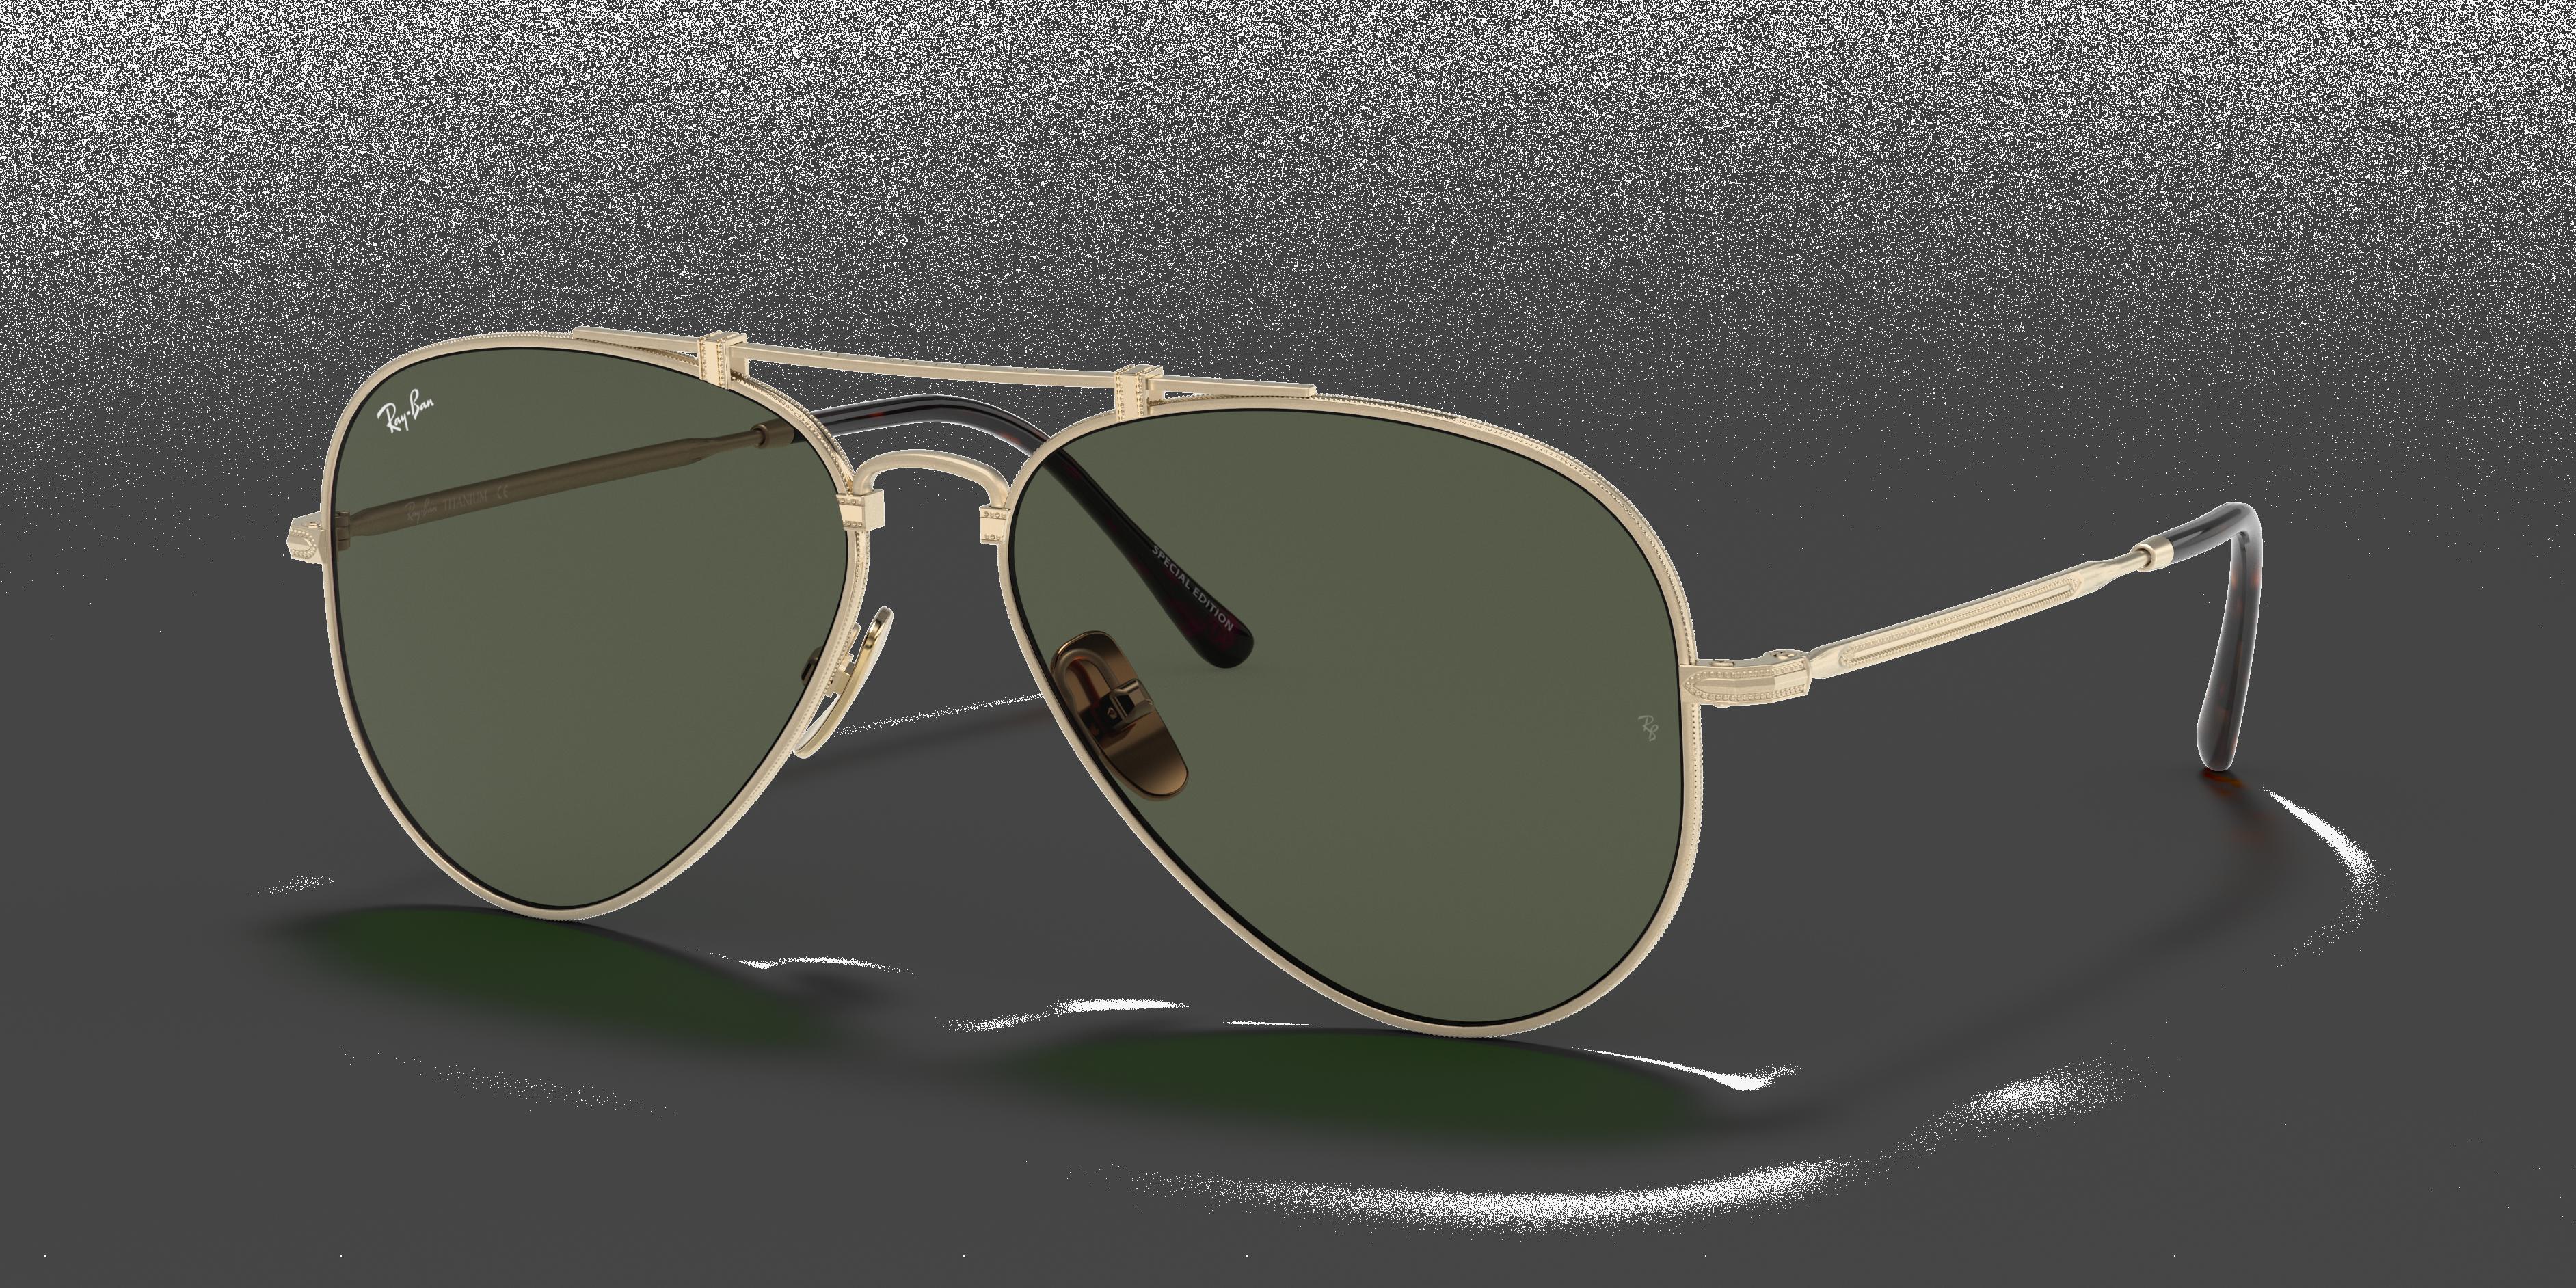 Ray-Ban Aviator Titanium Gold, Green Lenses - RB8125